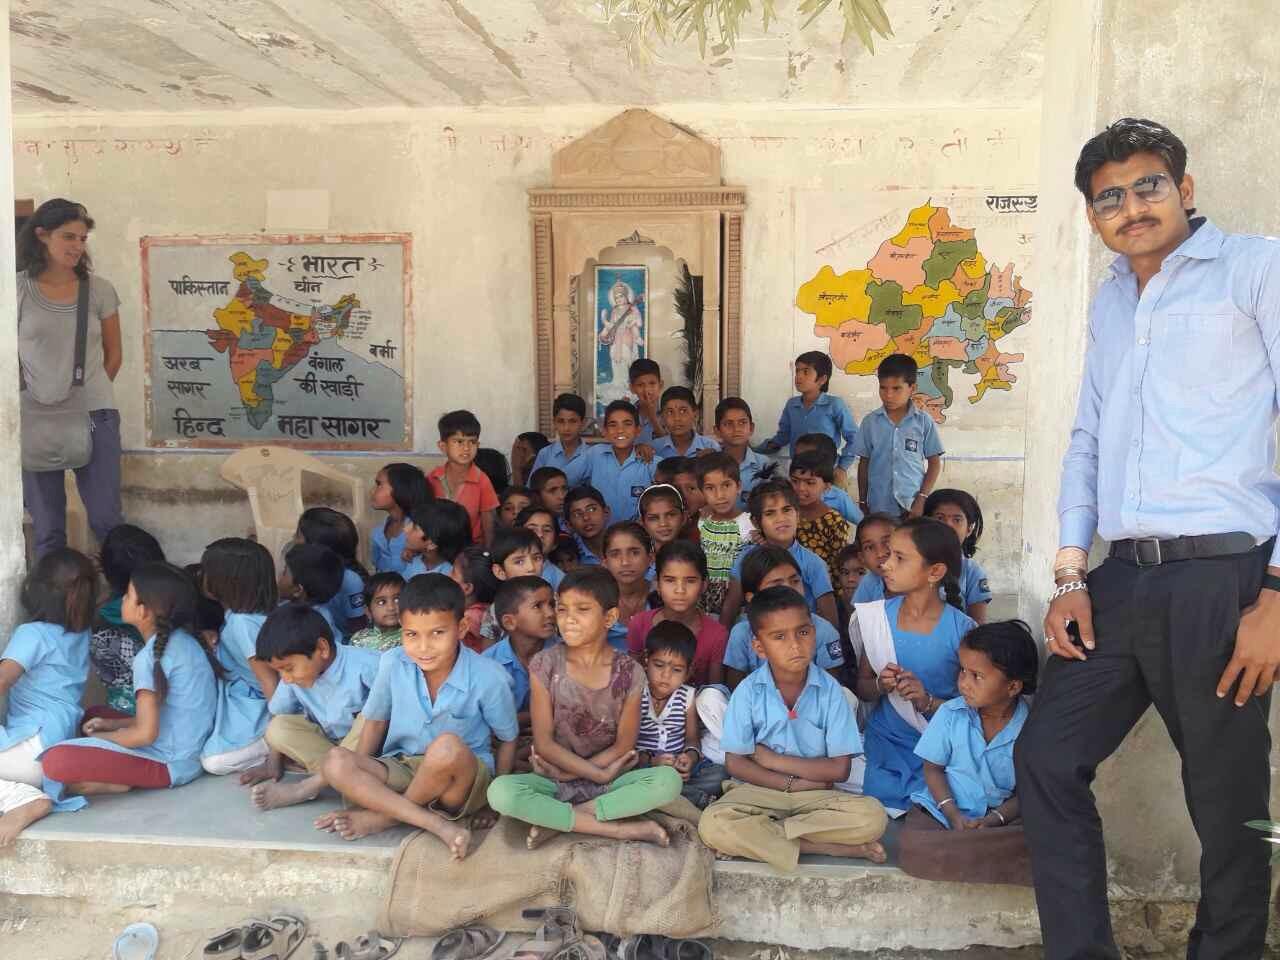 Hari visiting the children at school